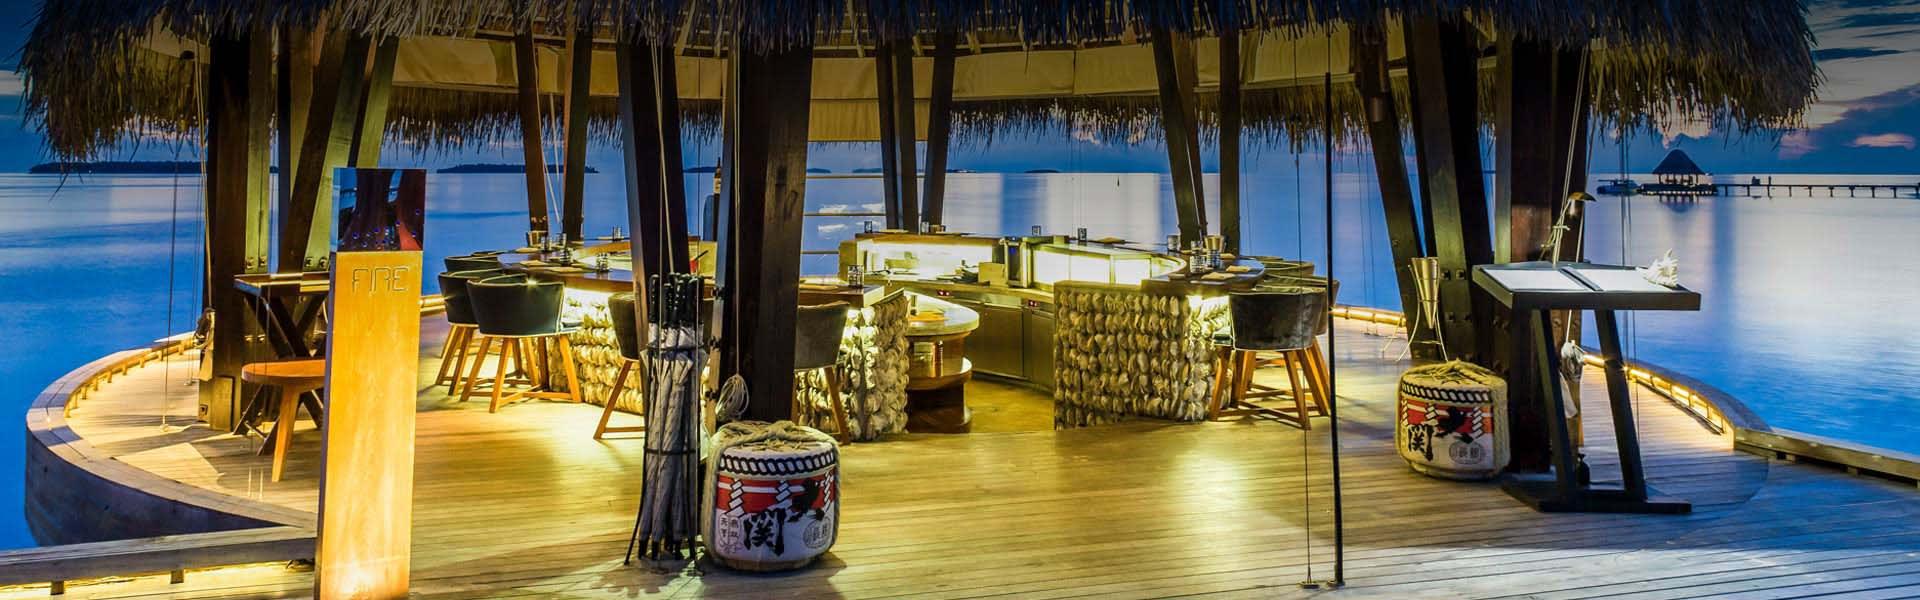 Dining at Fire in Anantara Kihavah Luxury Resort